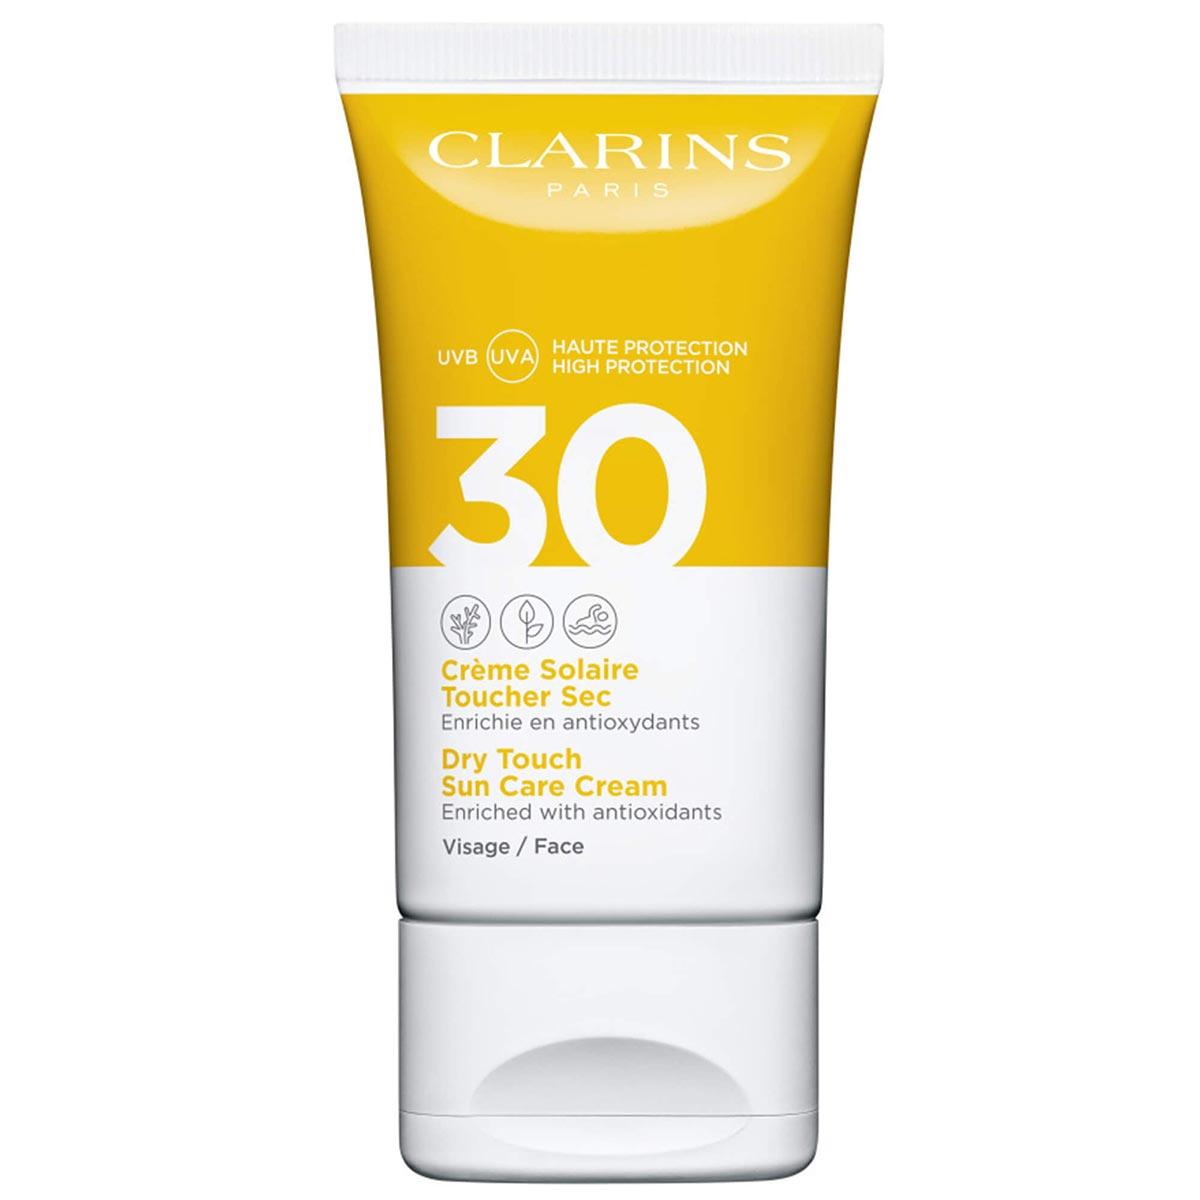 Crème Solaire Toucher Sec UVA/UVB 30 - CLARINS